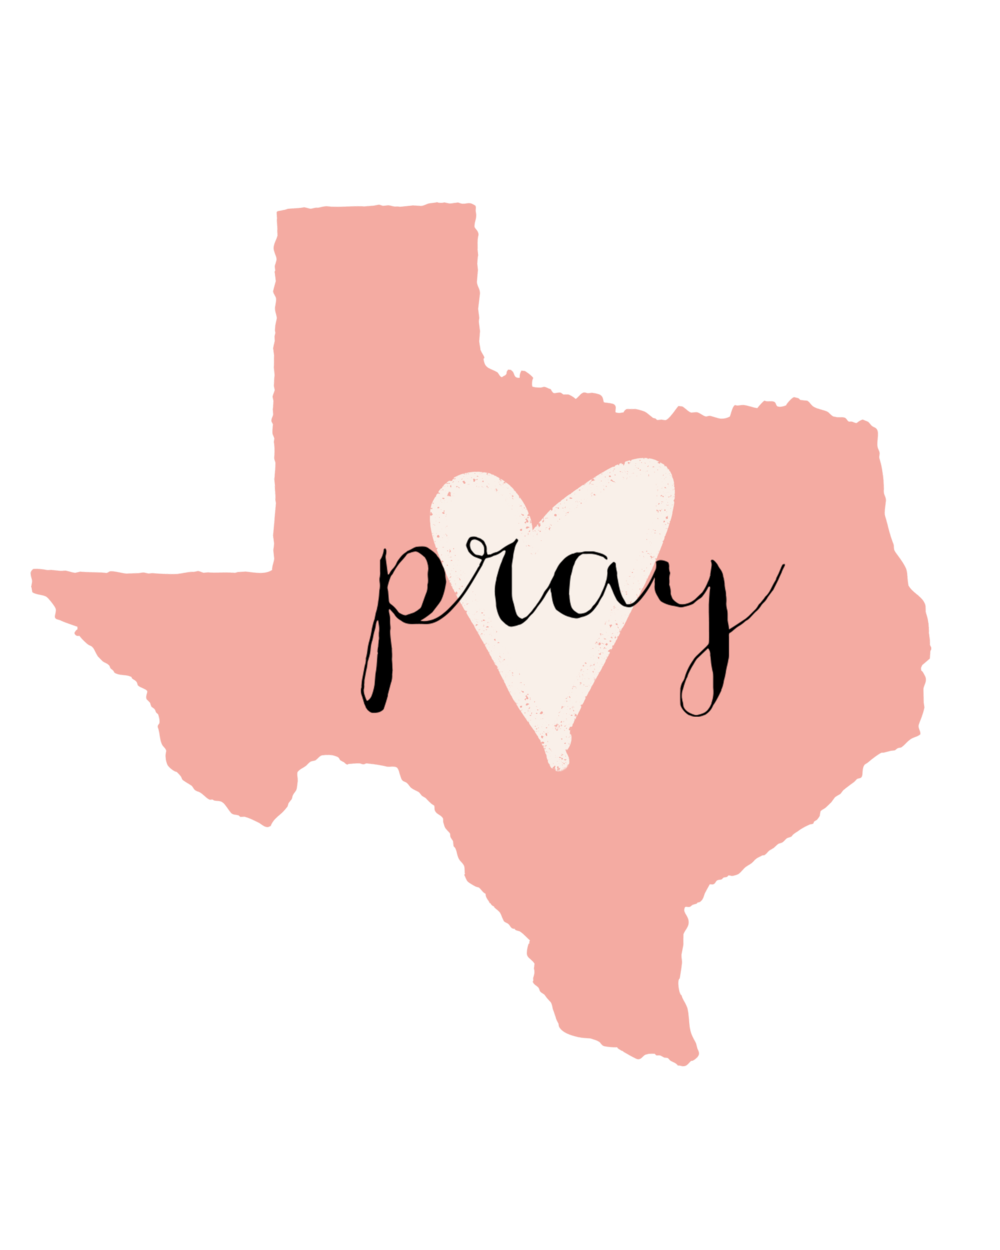 Pray v4.png